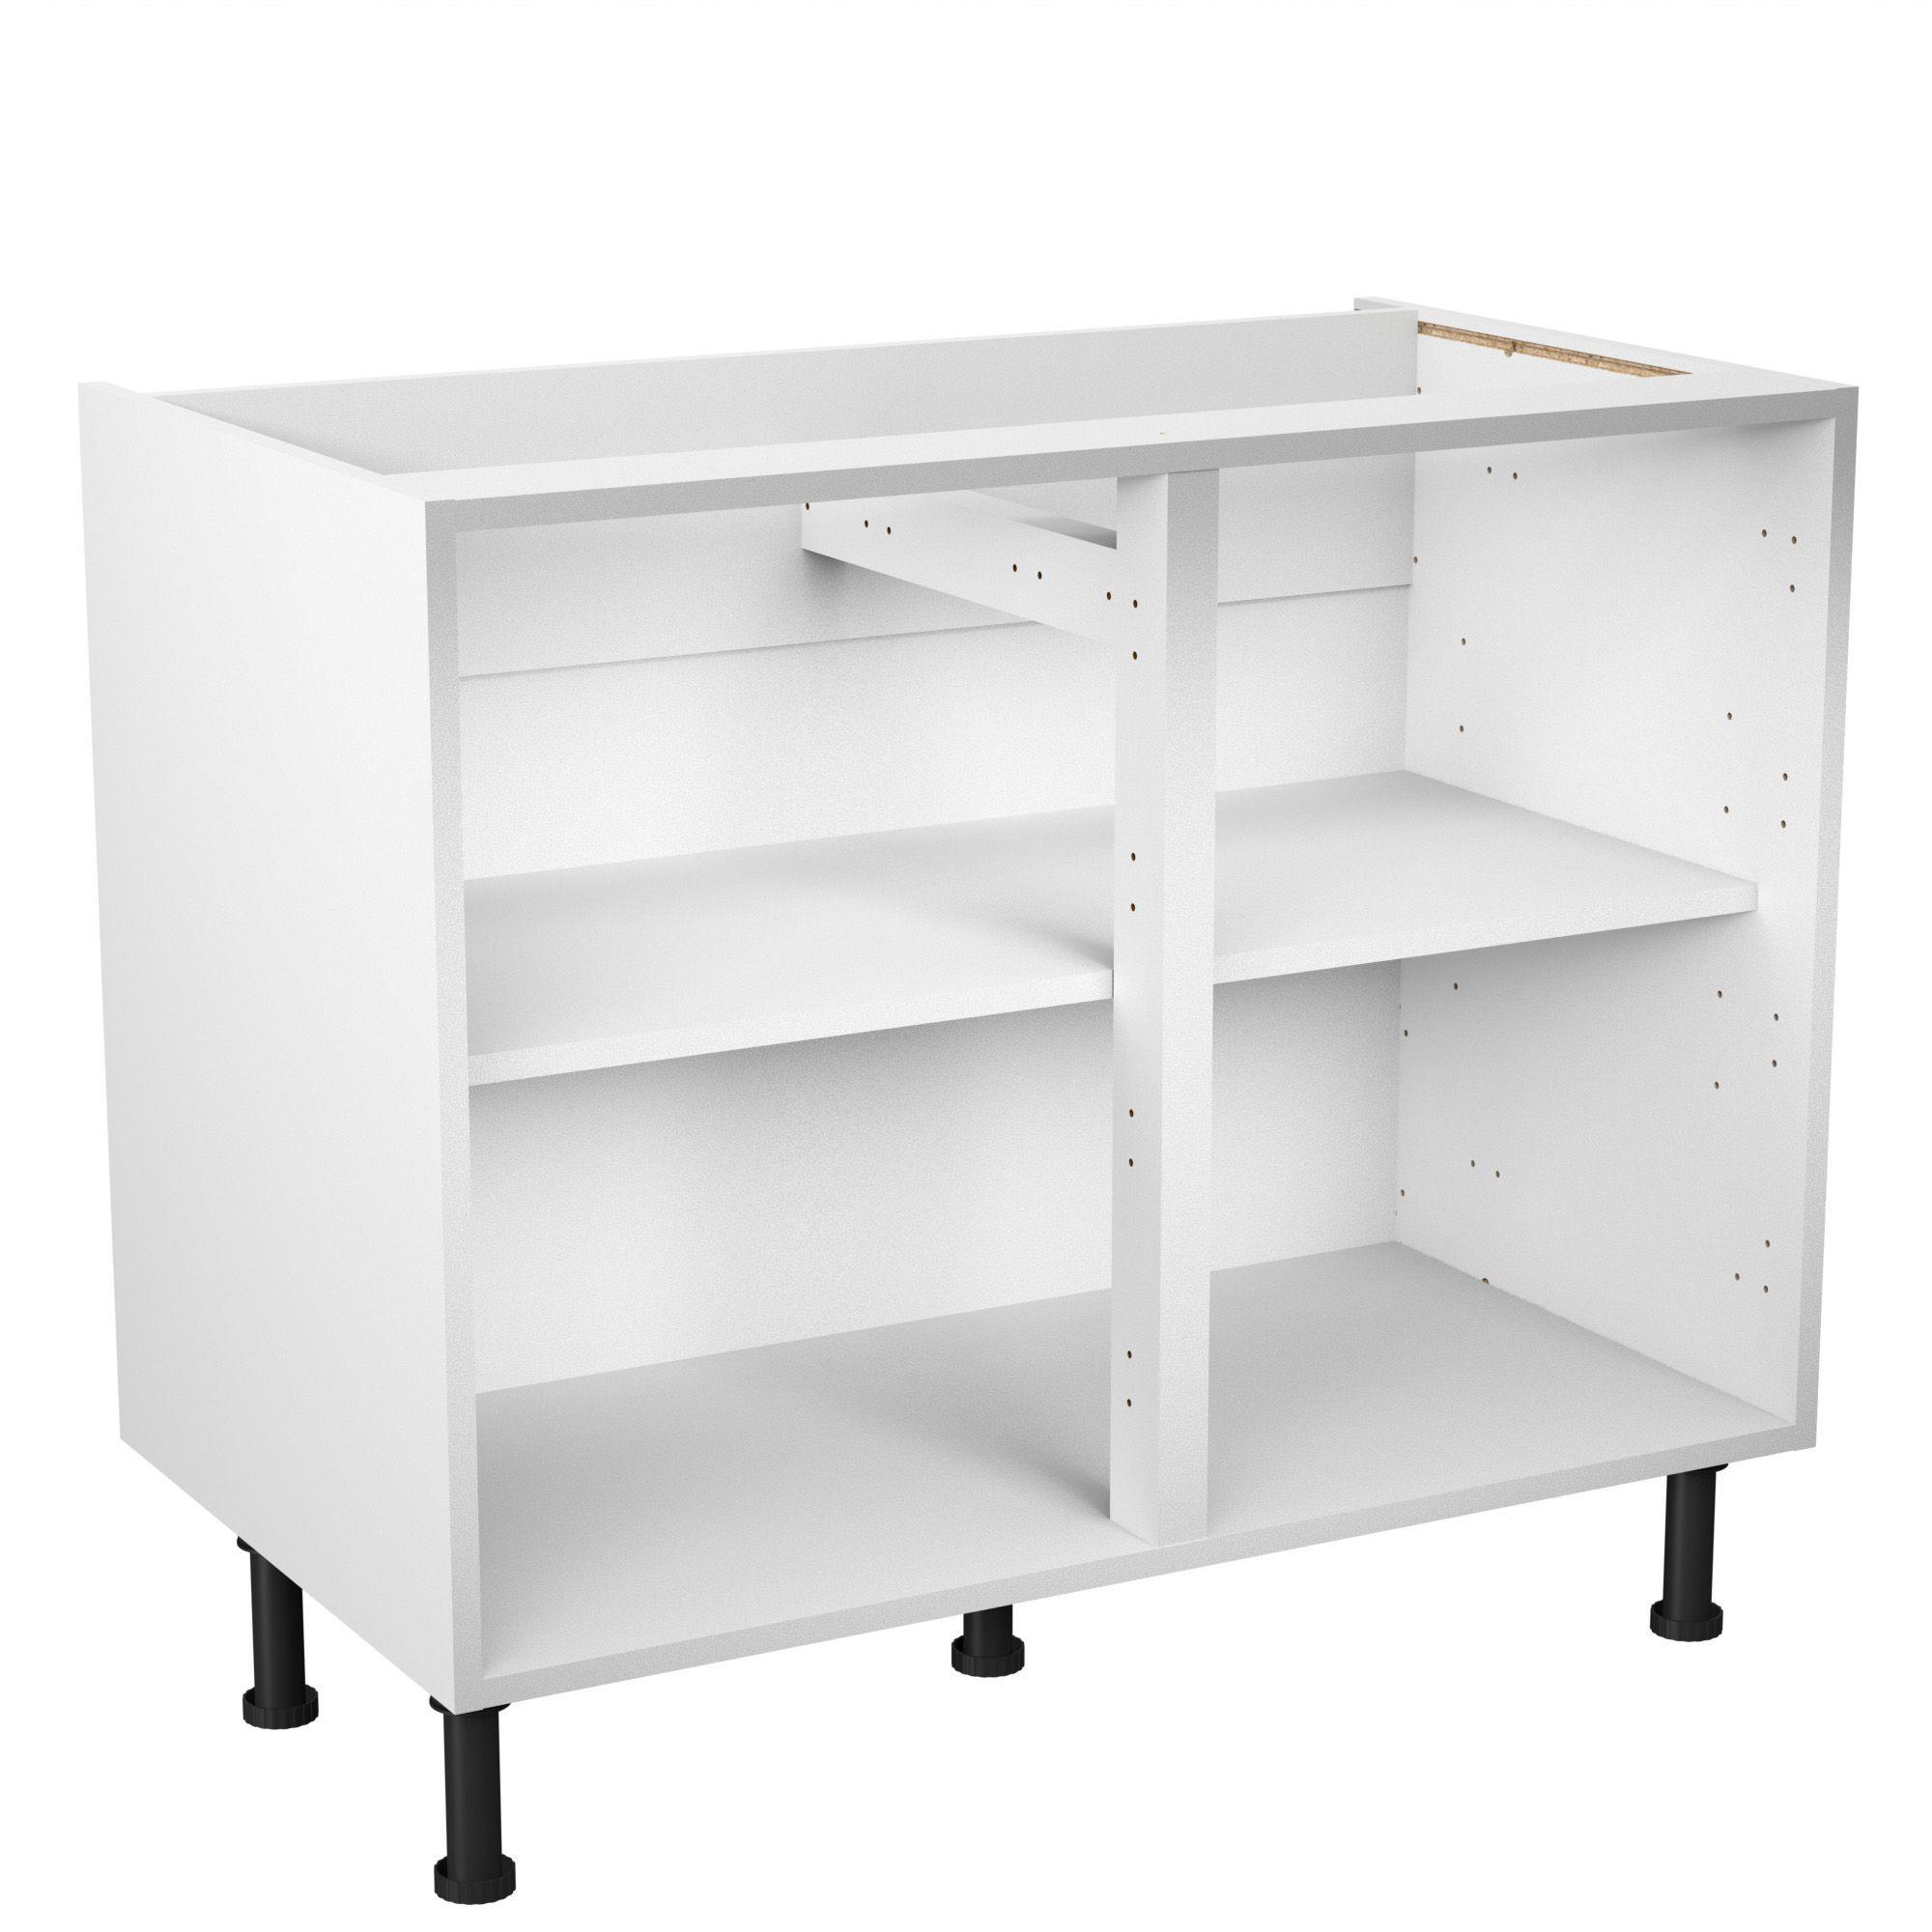 Cooke Amp Lewis Clic White Standard Base Cabinet Unit